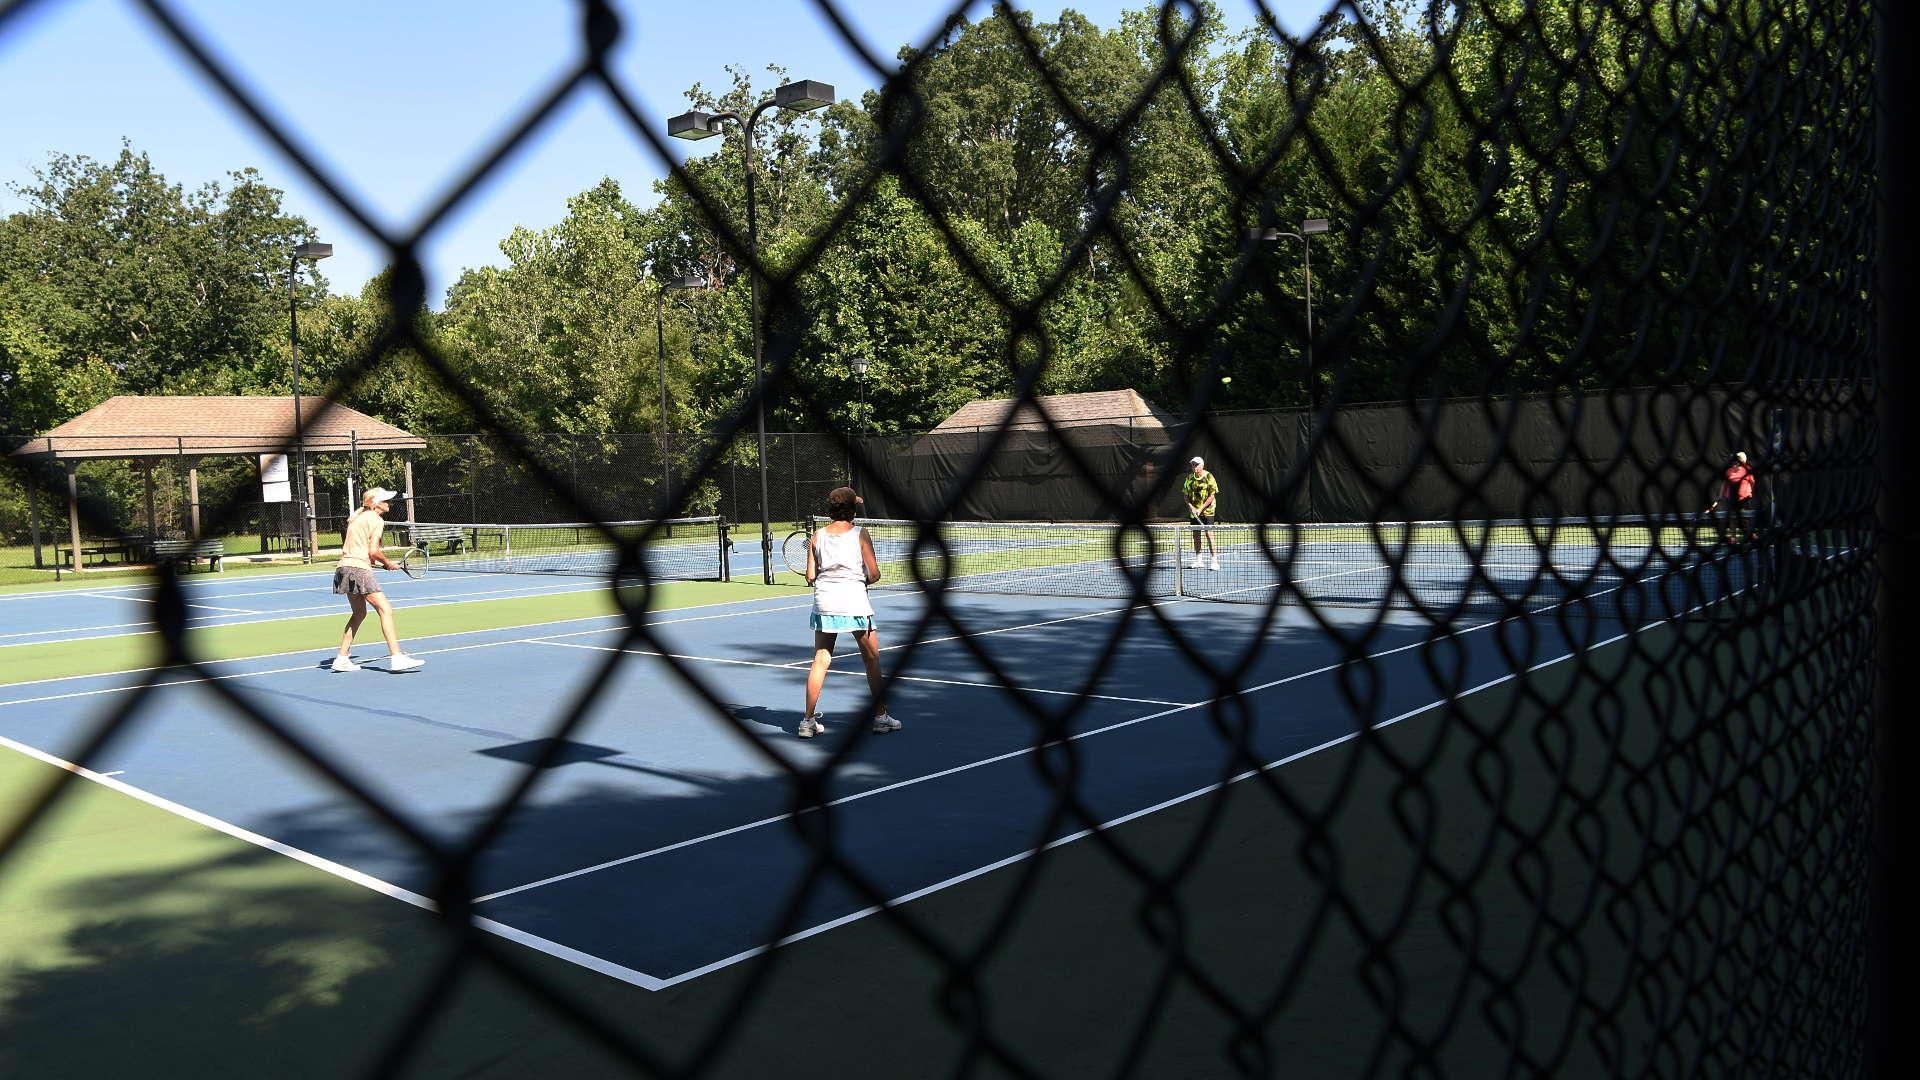 Benson Tennis Club